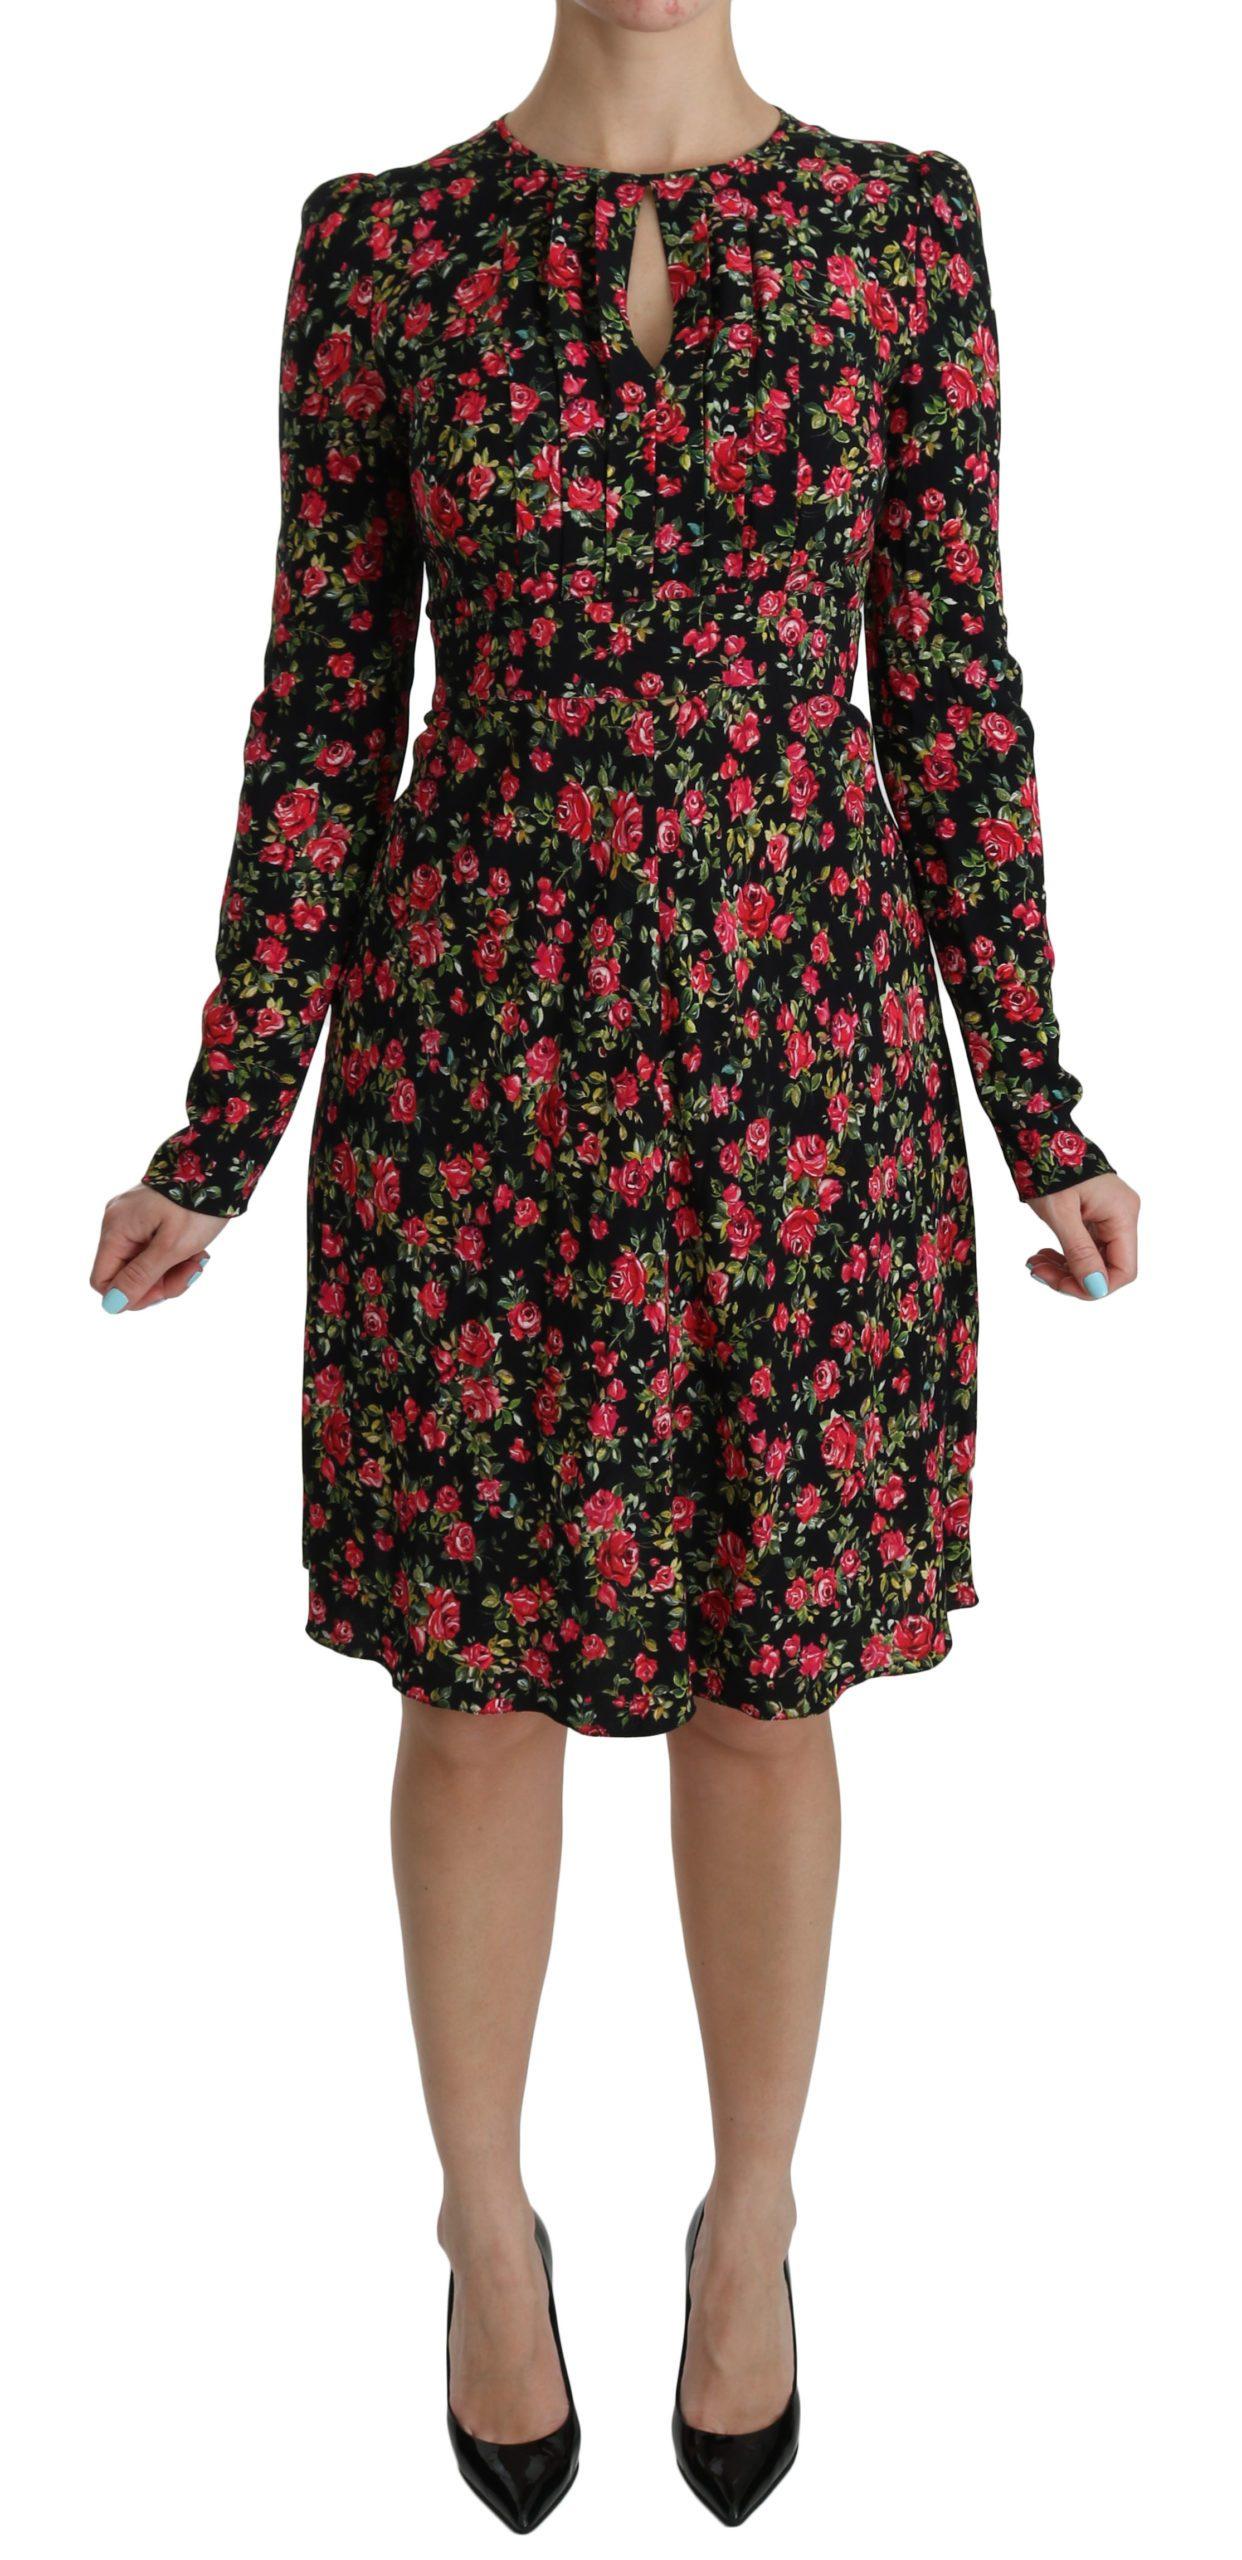 Dolce & Gabbana Women's Floral Longsleeve Knee Length Dress Black DR2088 - IT38|XS